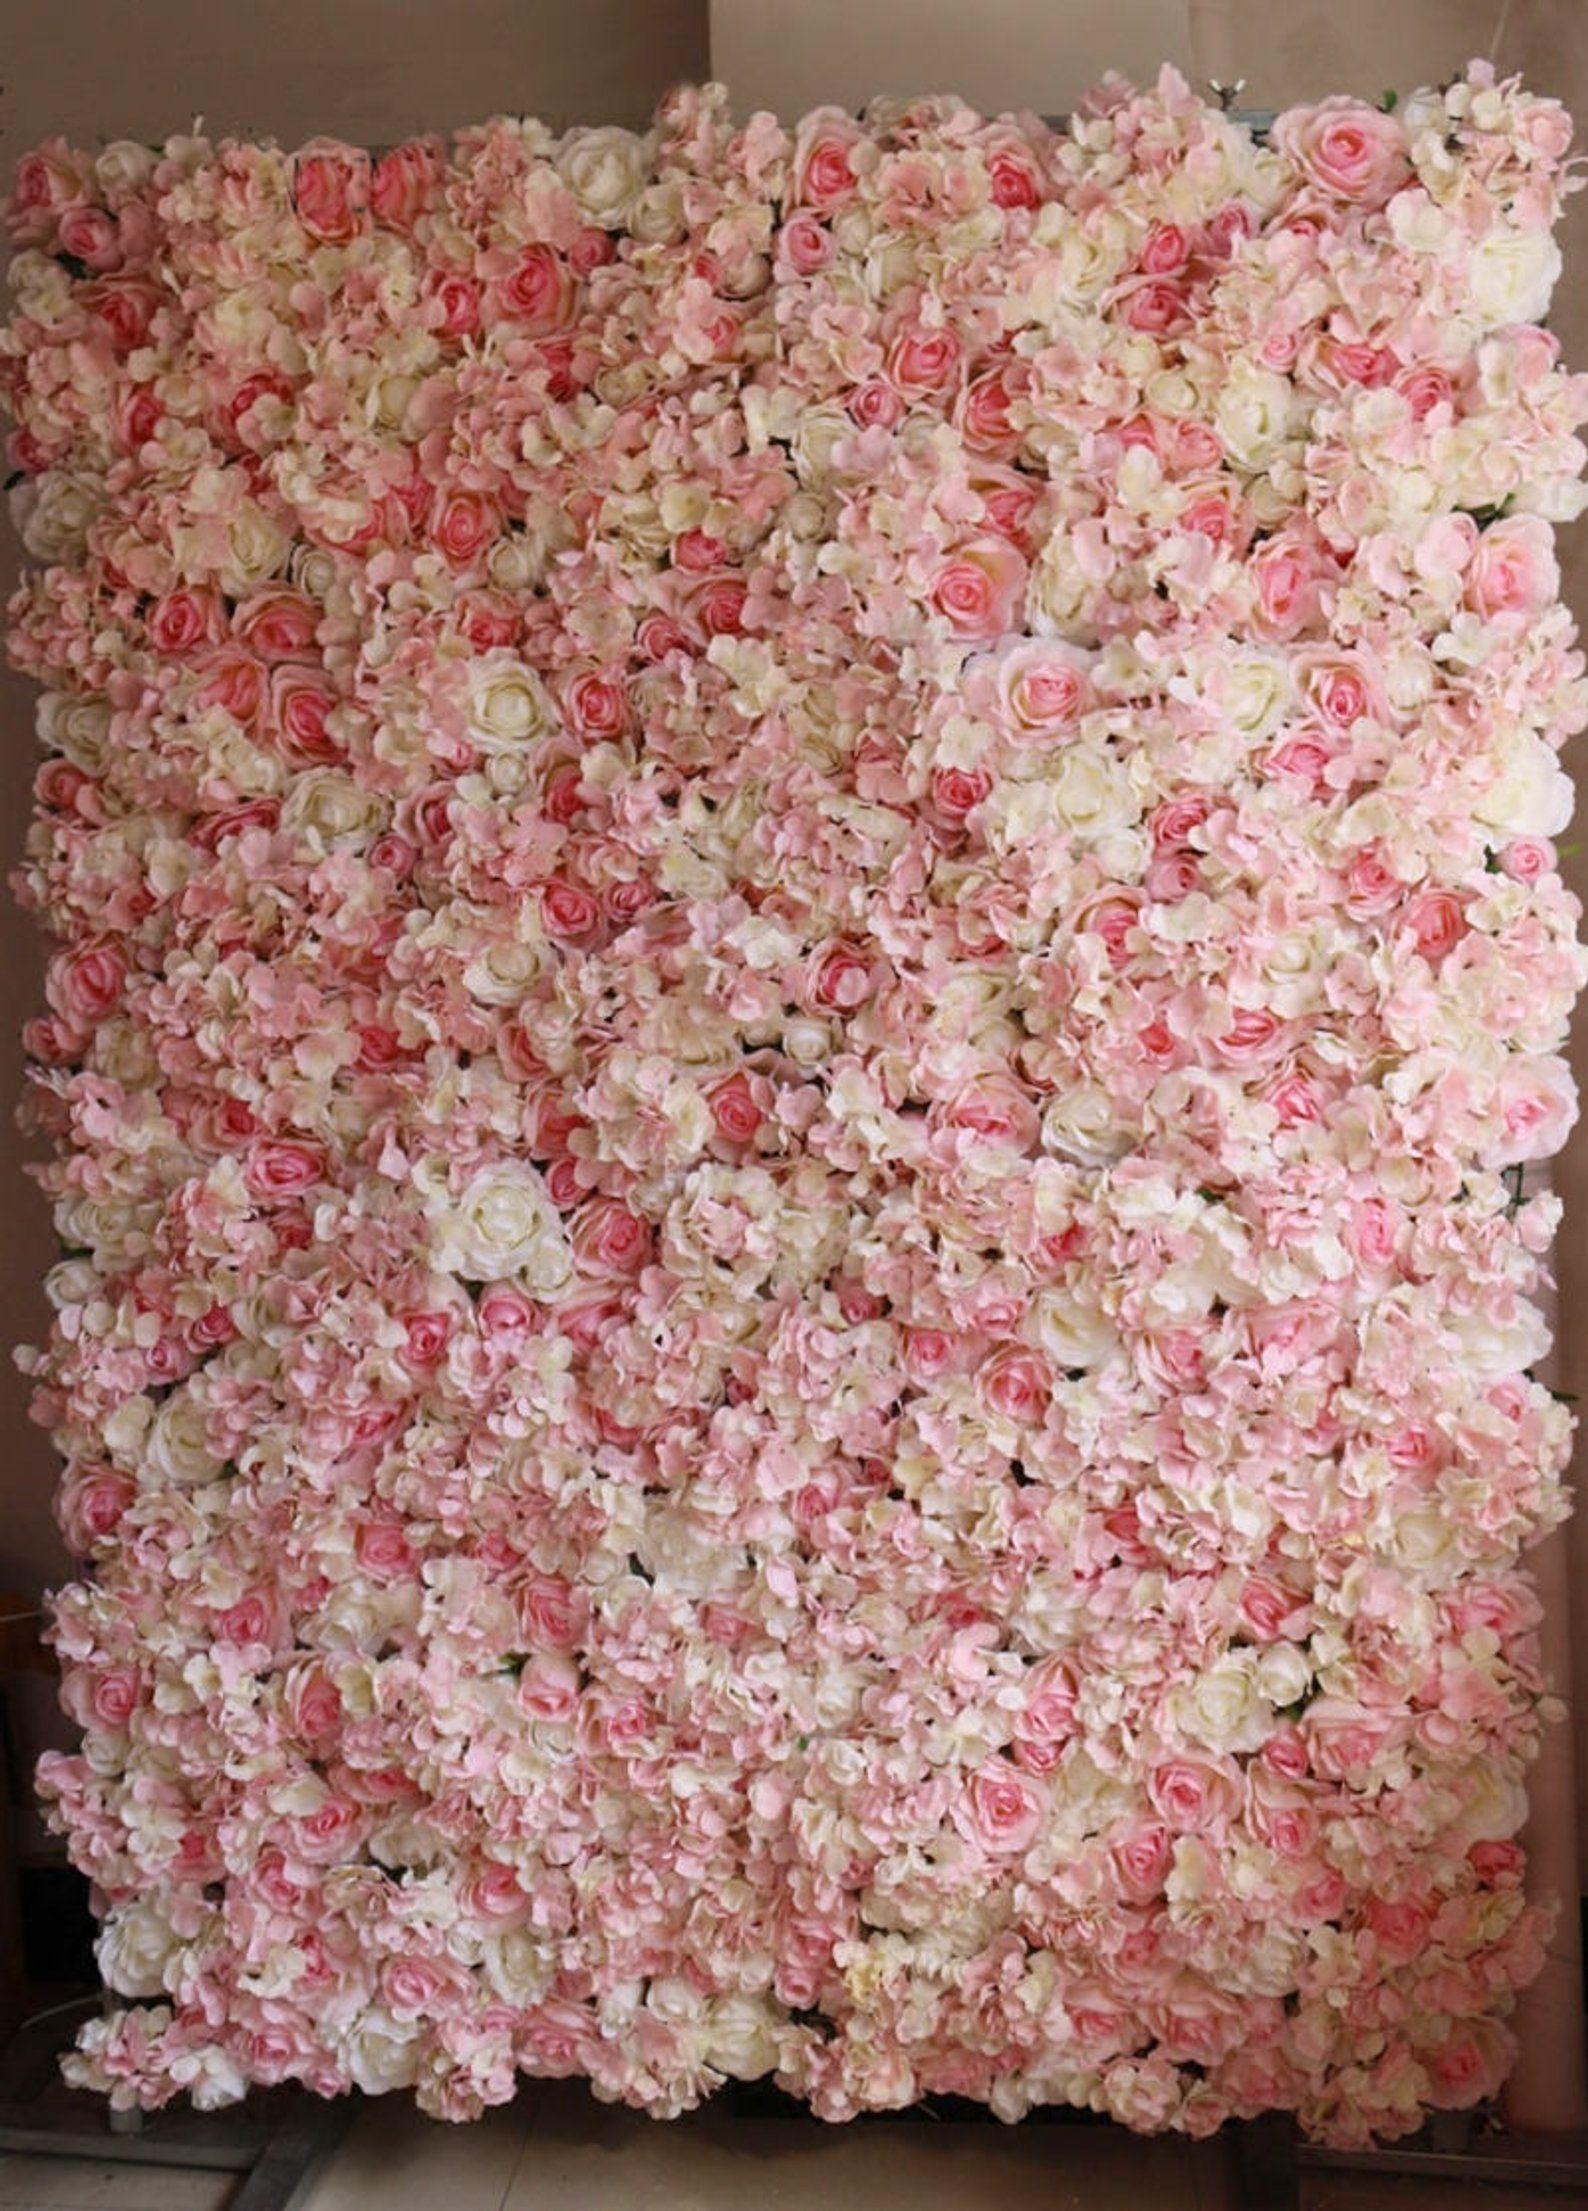 Baby Pink Wedding Flower Walls Wedding Backdrops Artifical Silk Rose Hydrangea Background For Romantic Wedding Photography Panels 40 60cm Flower Wall Wedding Flower Wall Silk Roses